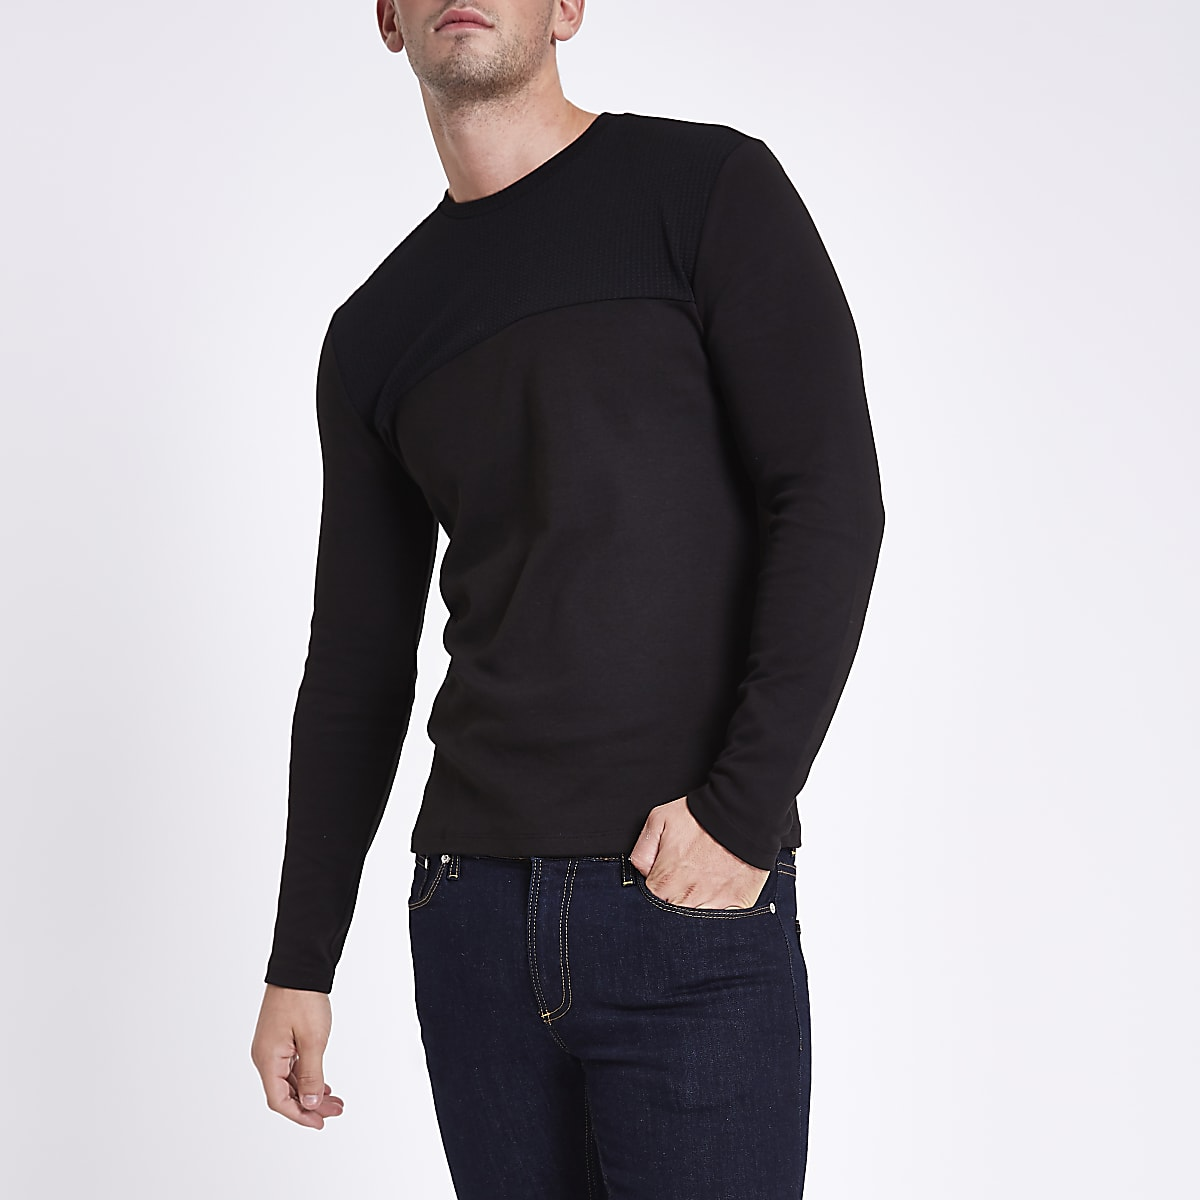 Black slim fit textured long sleeve t-shirt